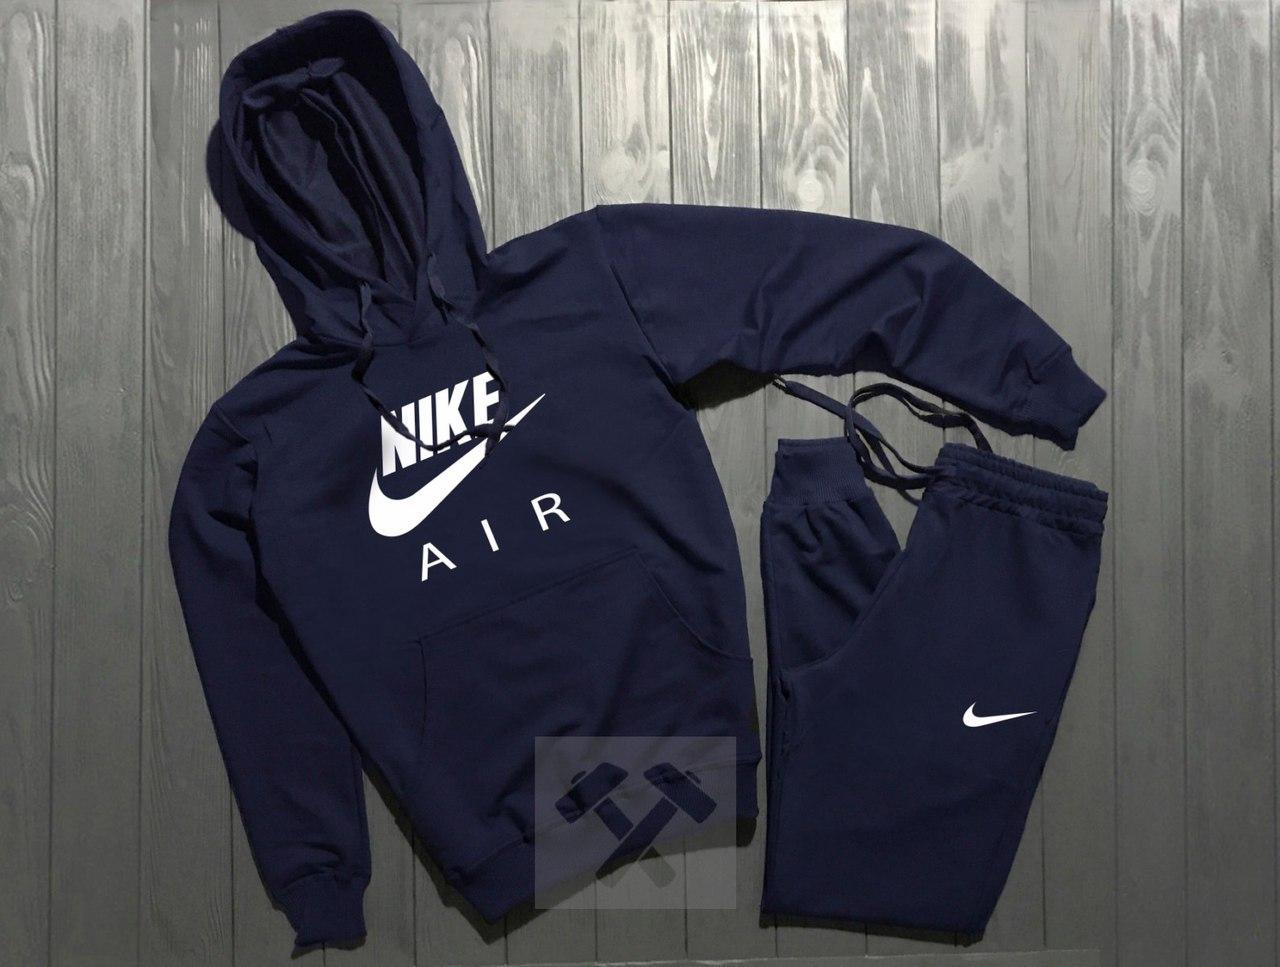 Весенний костюм спортивный Nike Air с капюшоном темно-синий топ реплика